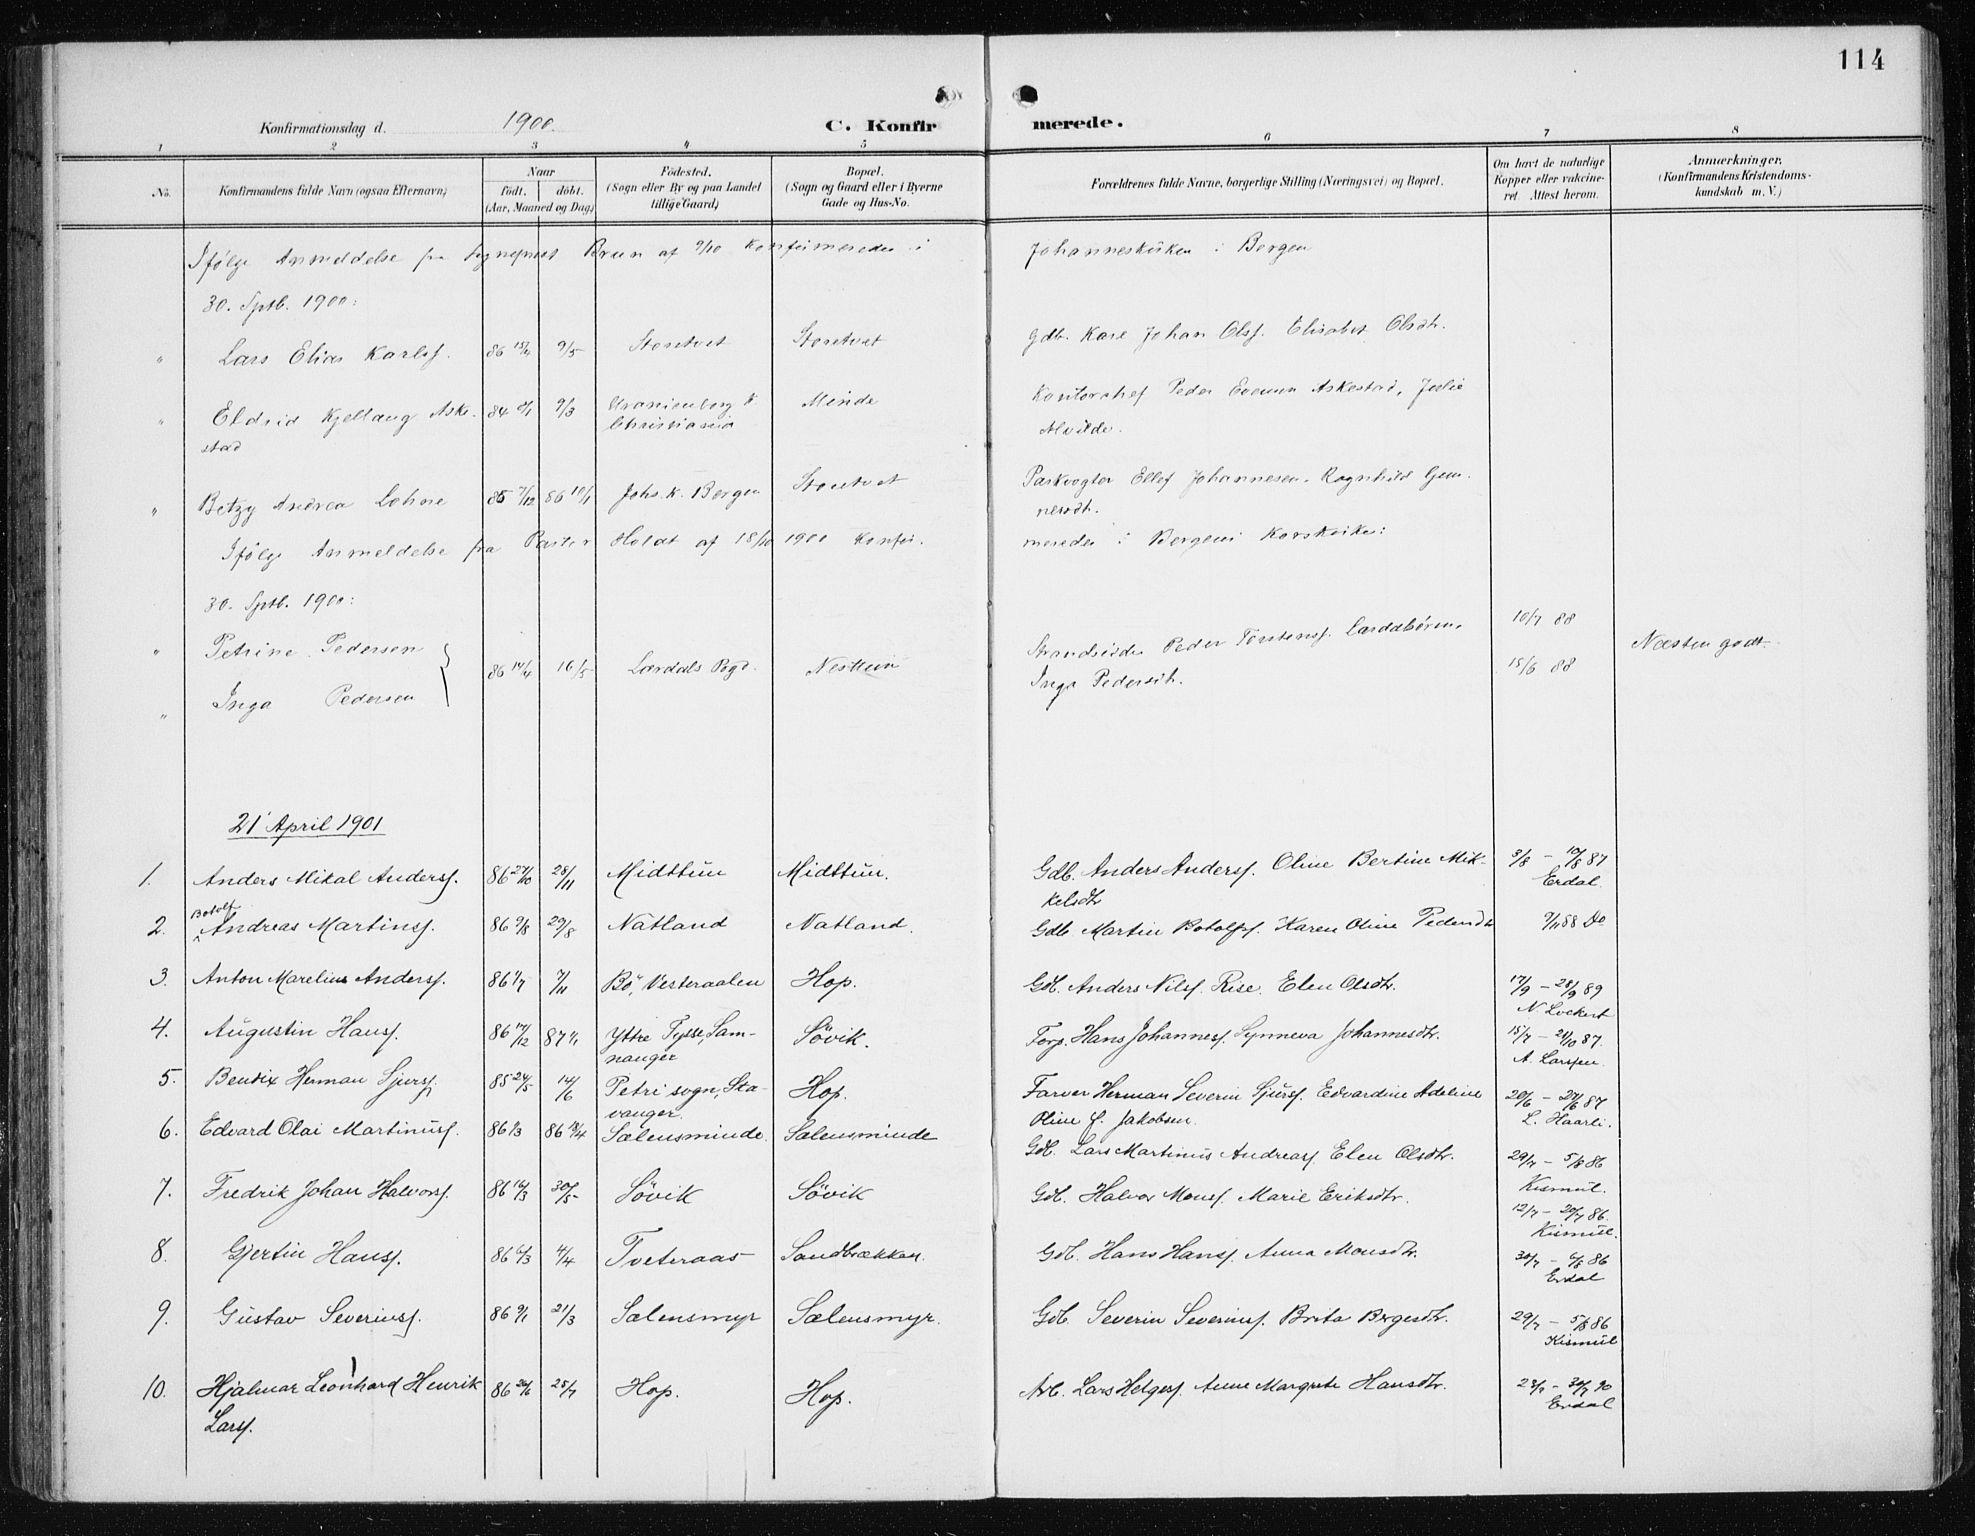 SAB, Fana Sokneprestembete, H/Haa/Haai/L0003: Ministerialbok nr. I 3, 1900-1912, s. 114